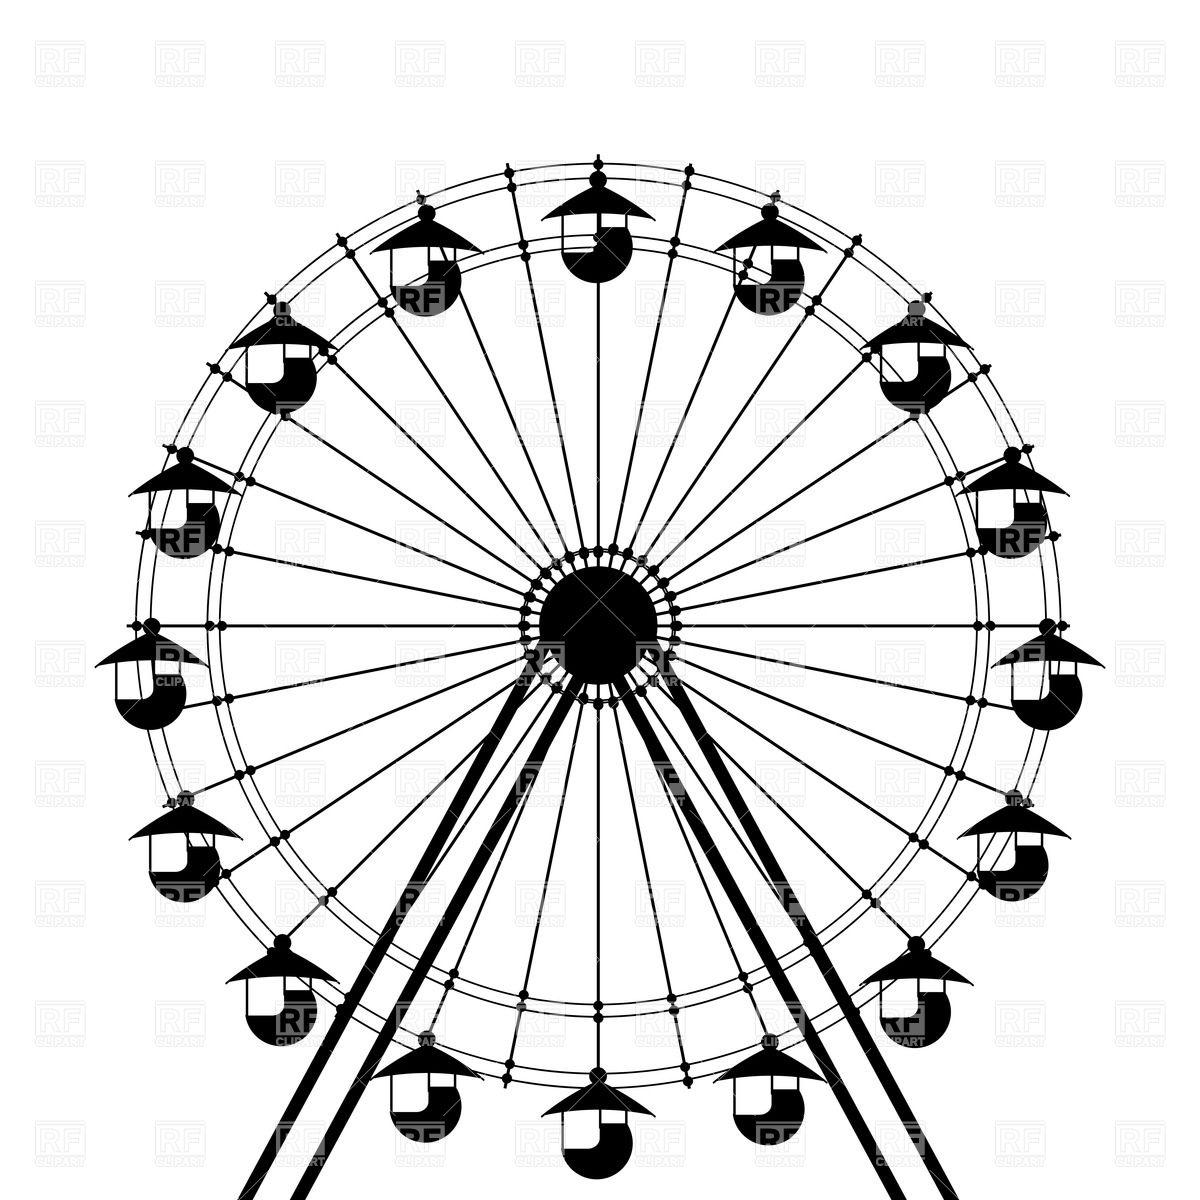 Carousel clipart giant wheel Free Ferris Wheel Silhouette Pictures